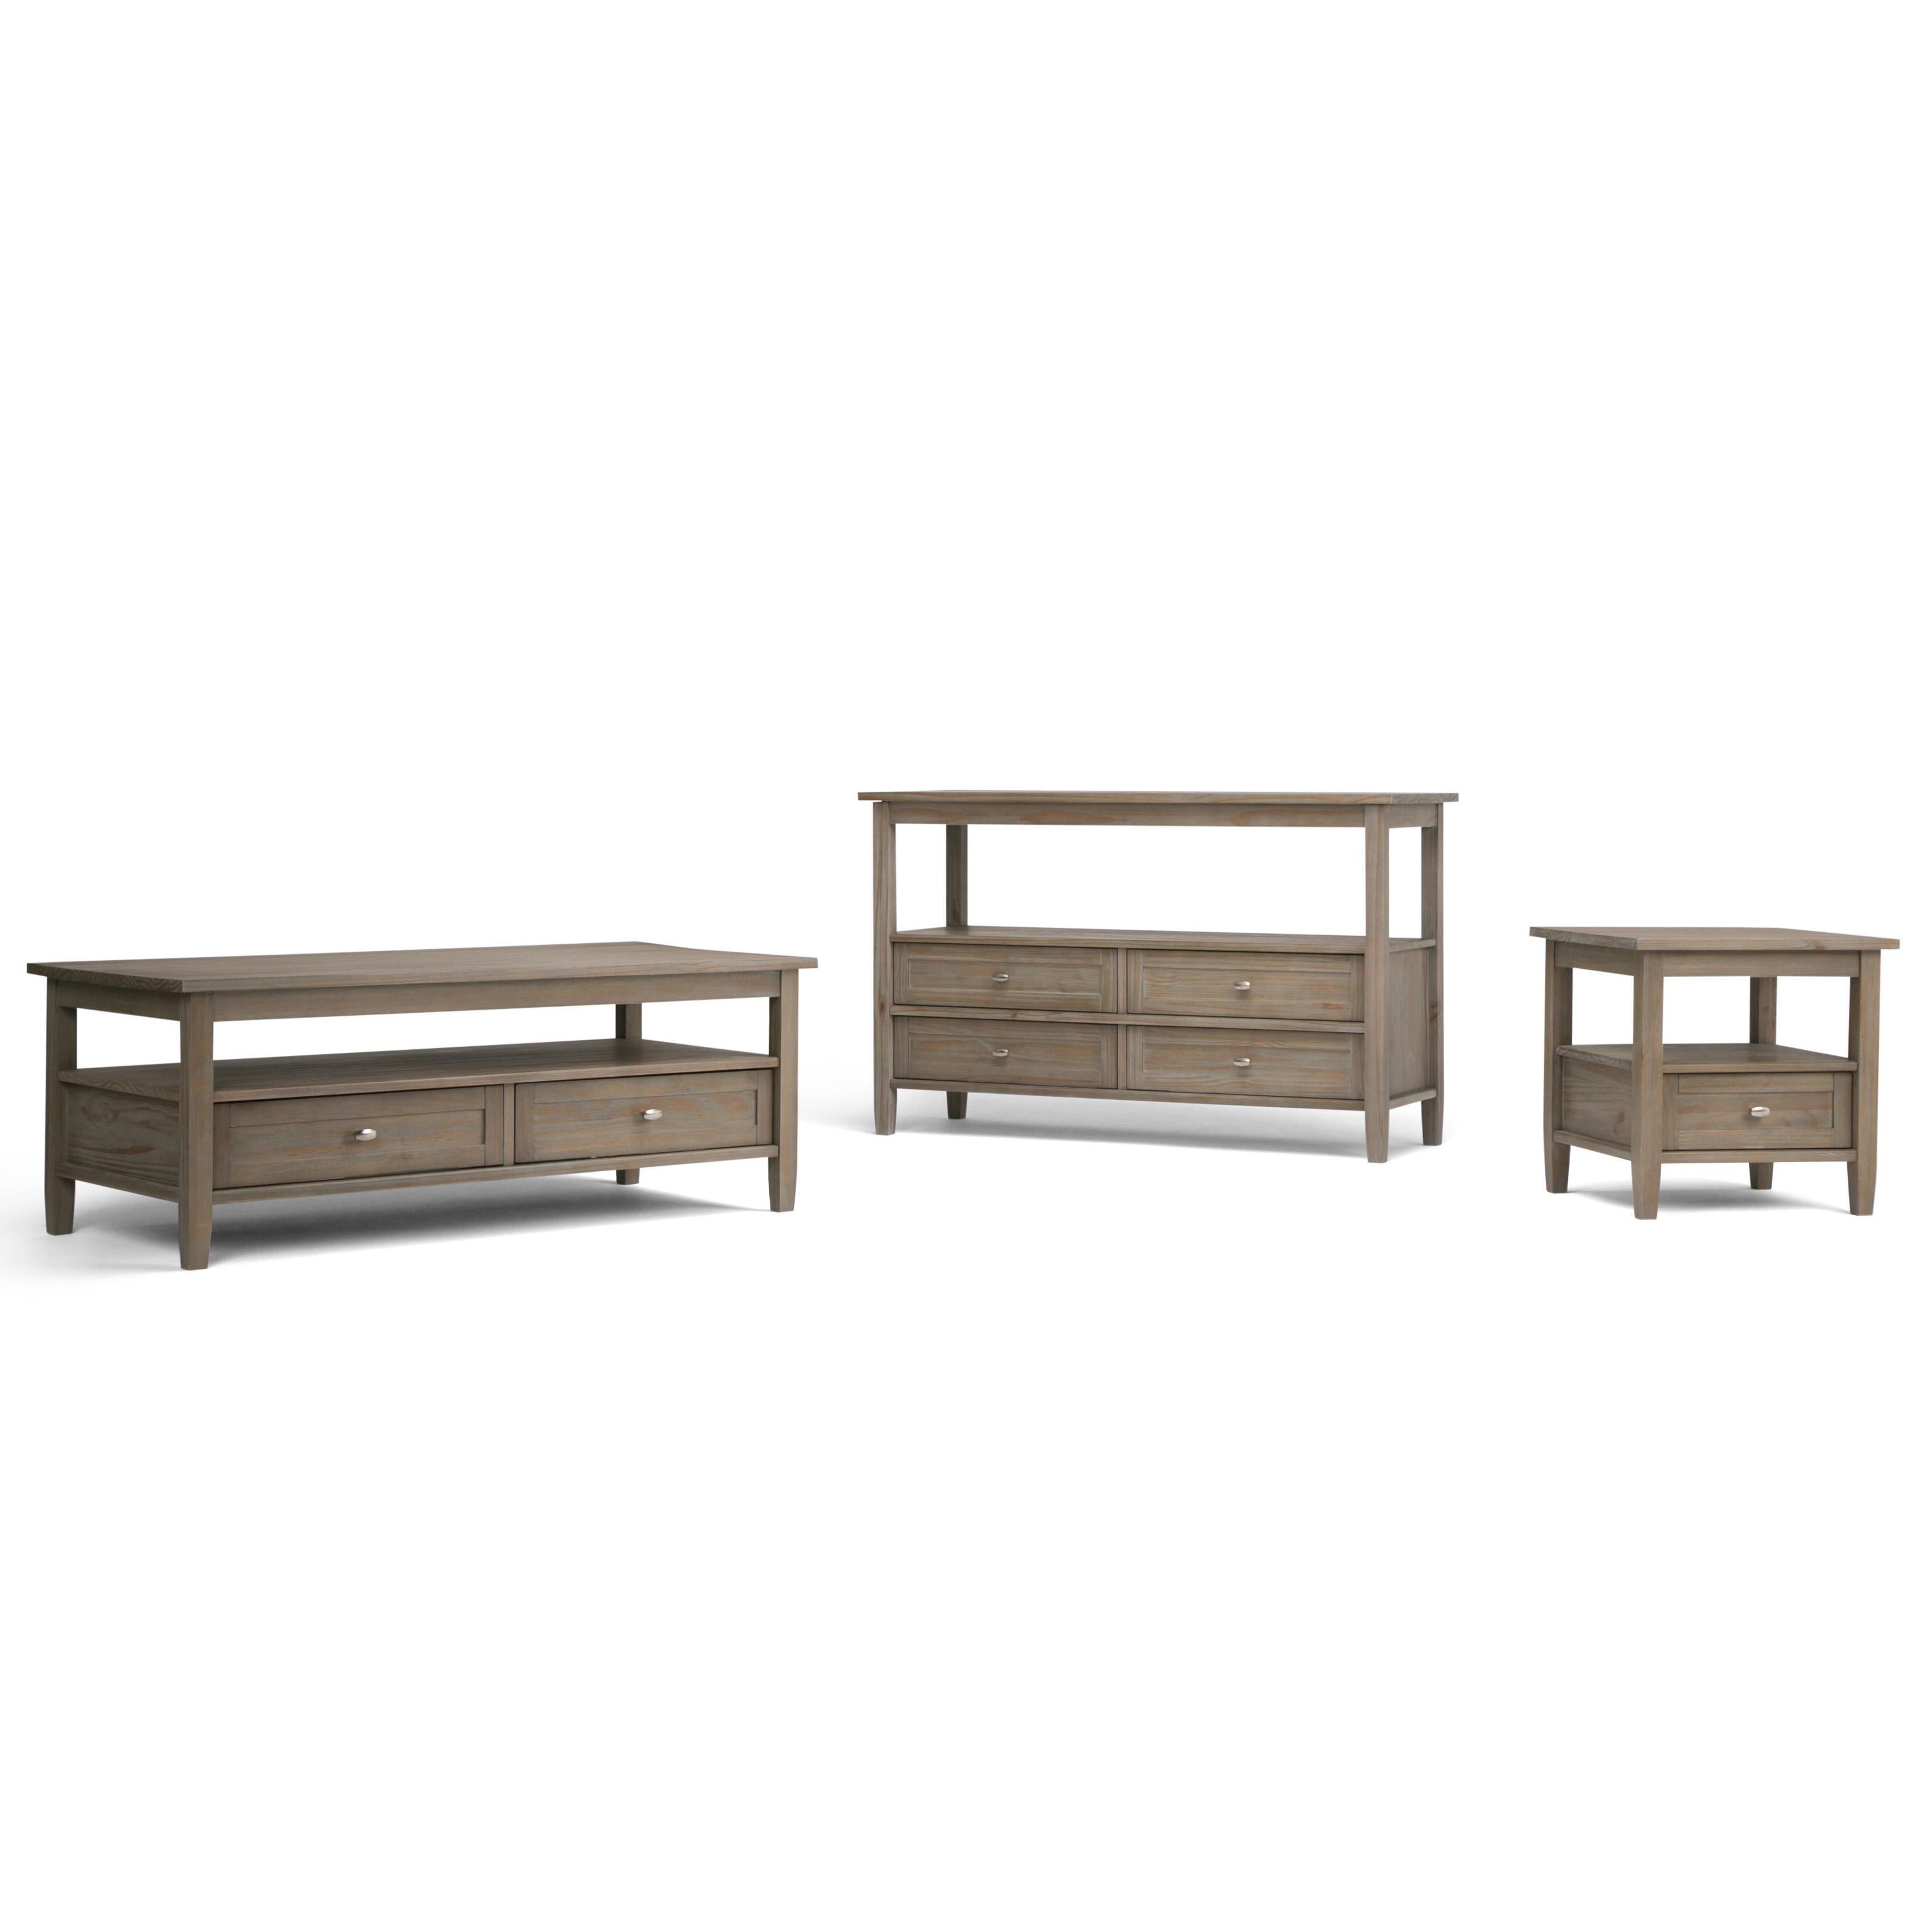 Amazon.com: Simpli Home AXWSH001-GR Warm Shaker Solid Wood